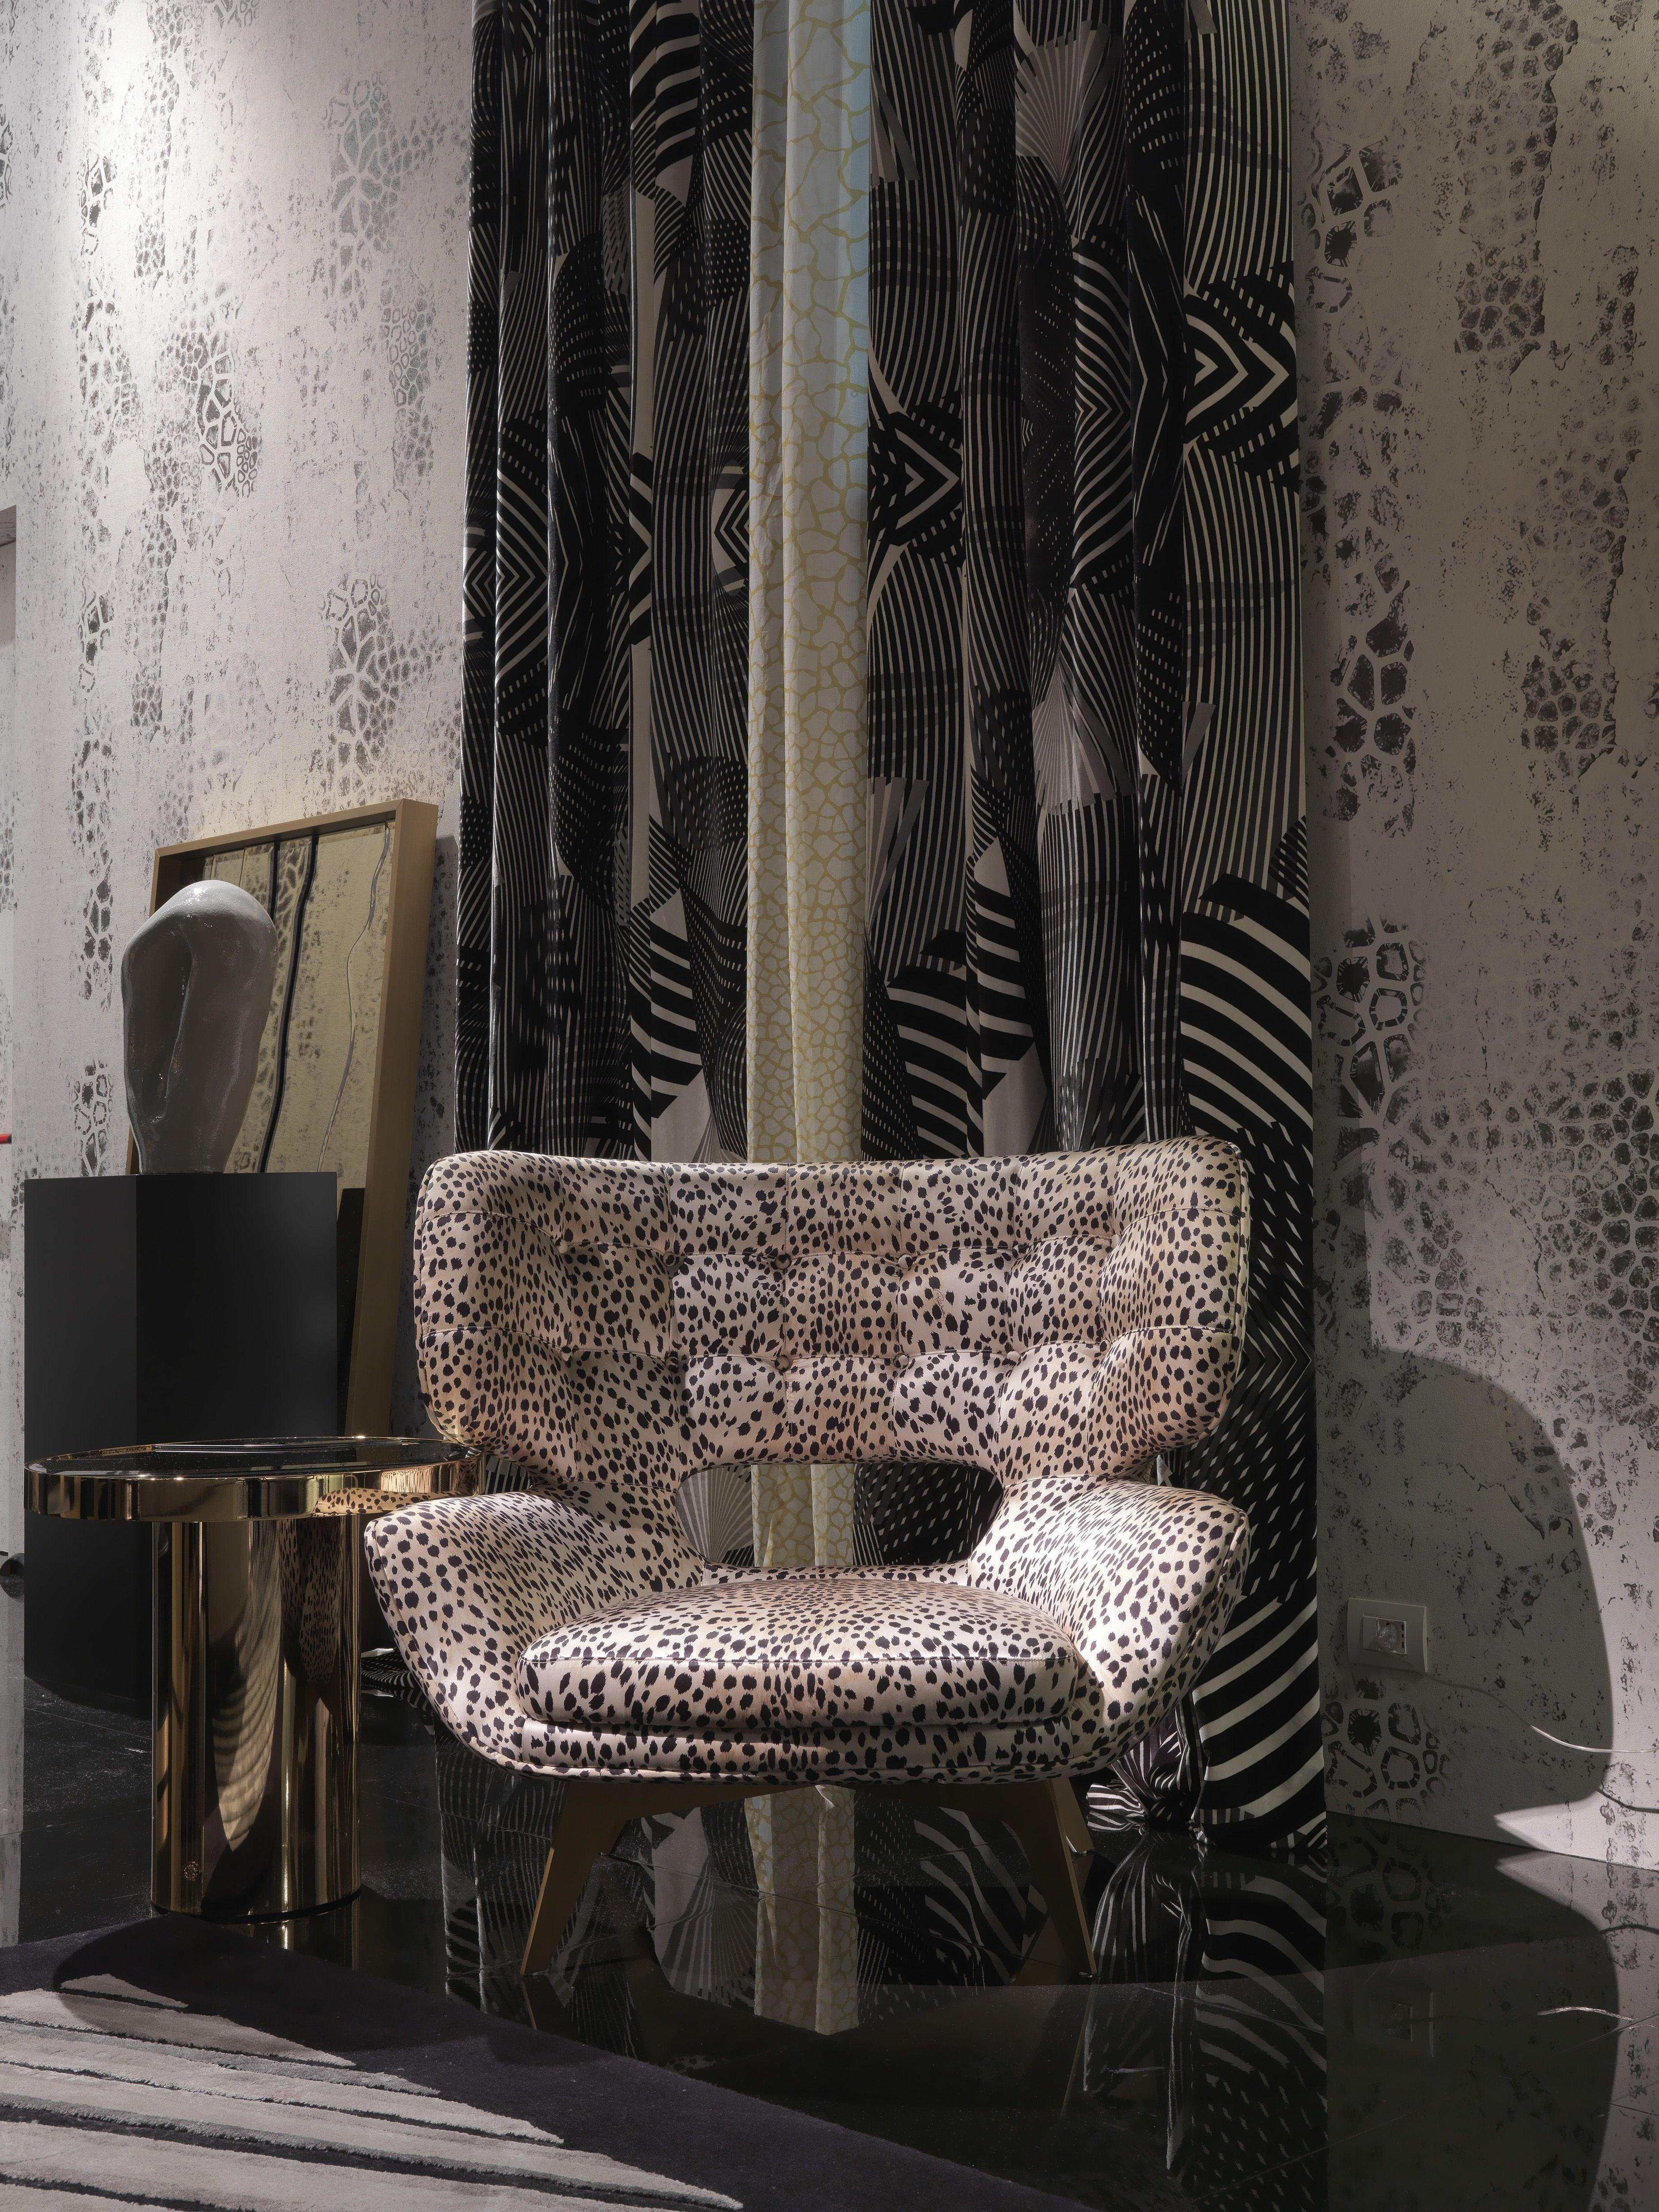 Roberto Cavalli Interiors 2018 #interiors #home #fashion #RobertoCavalli